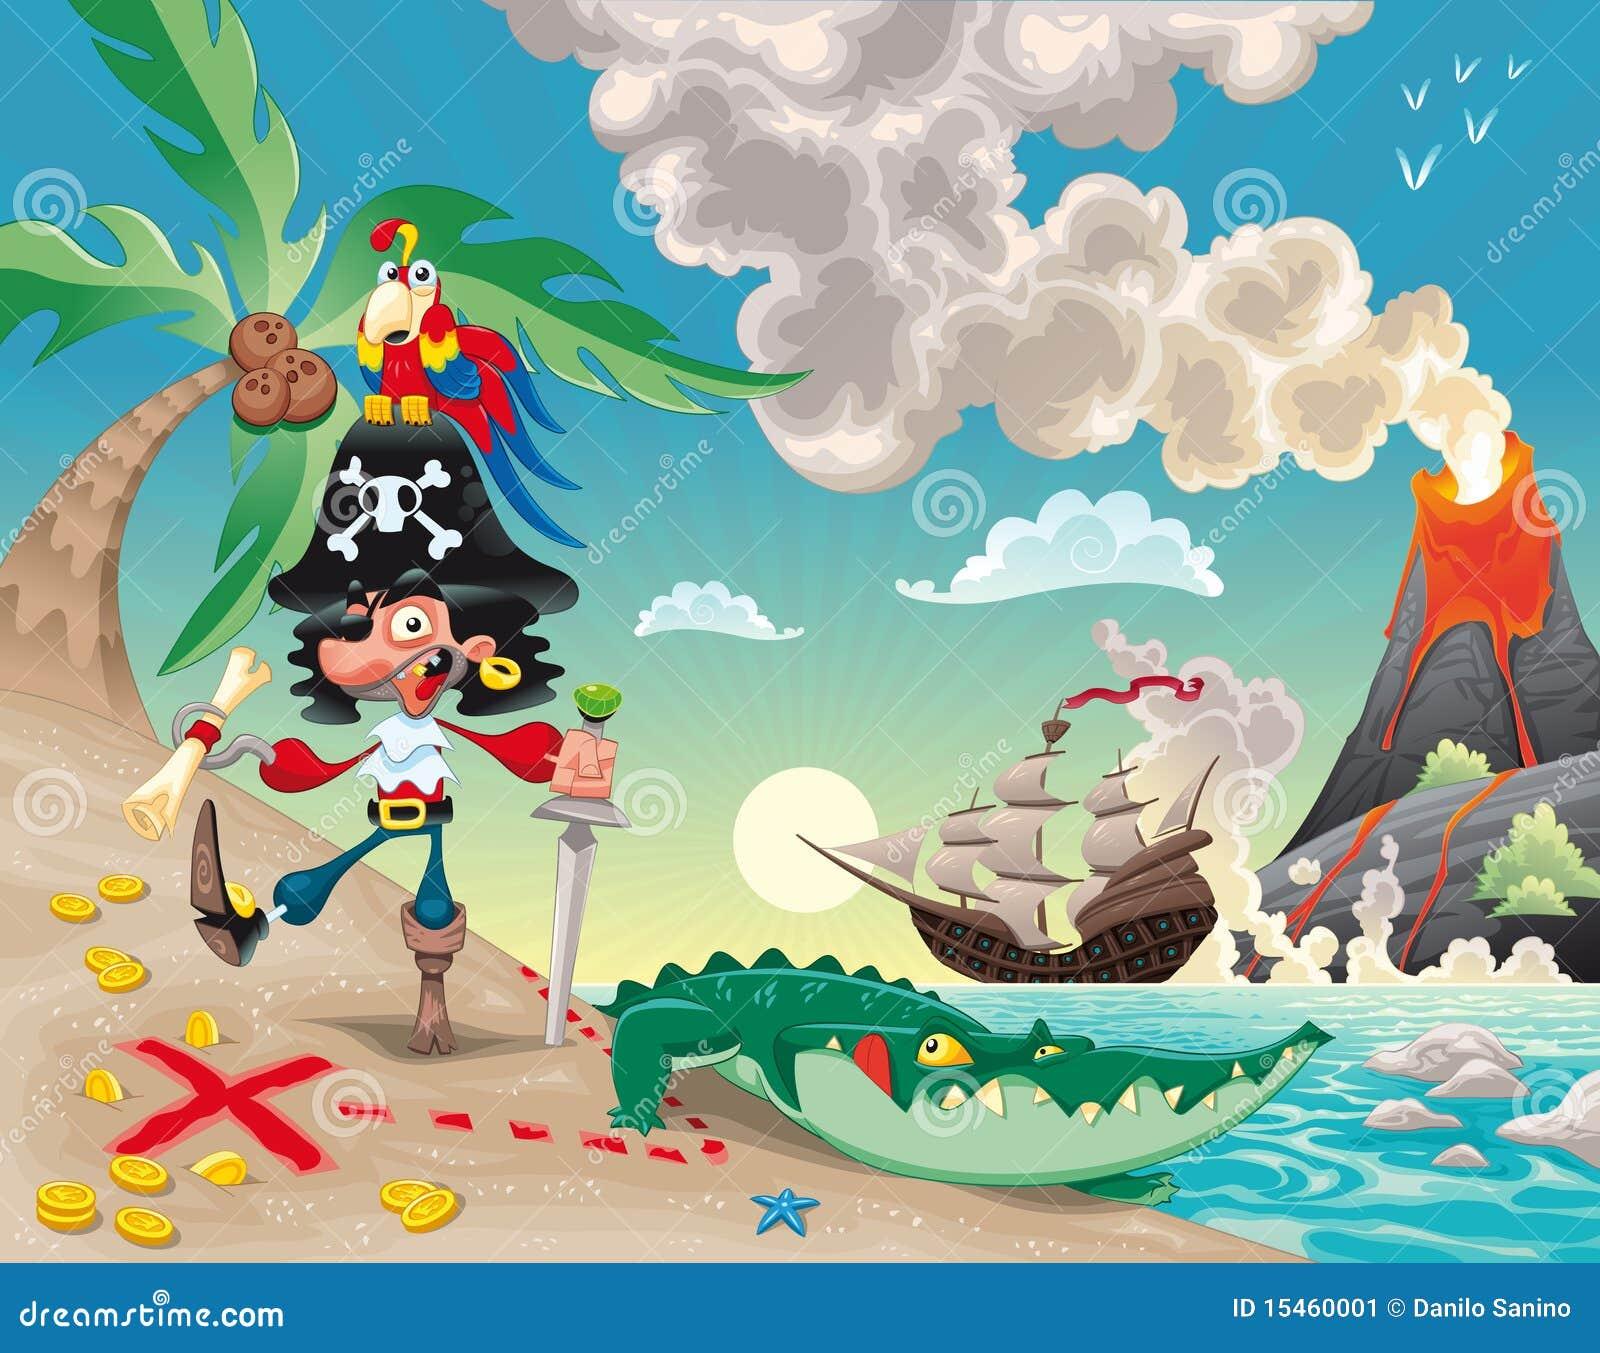 pirate-kid-clipart